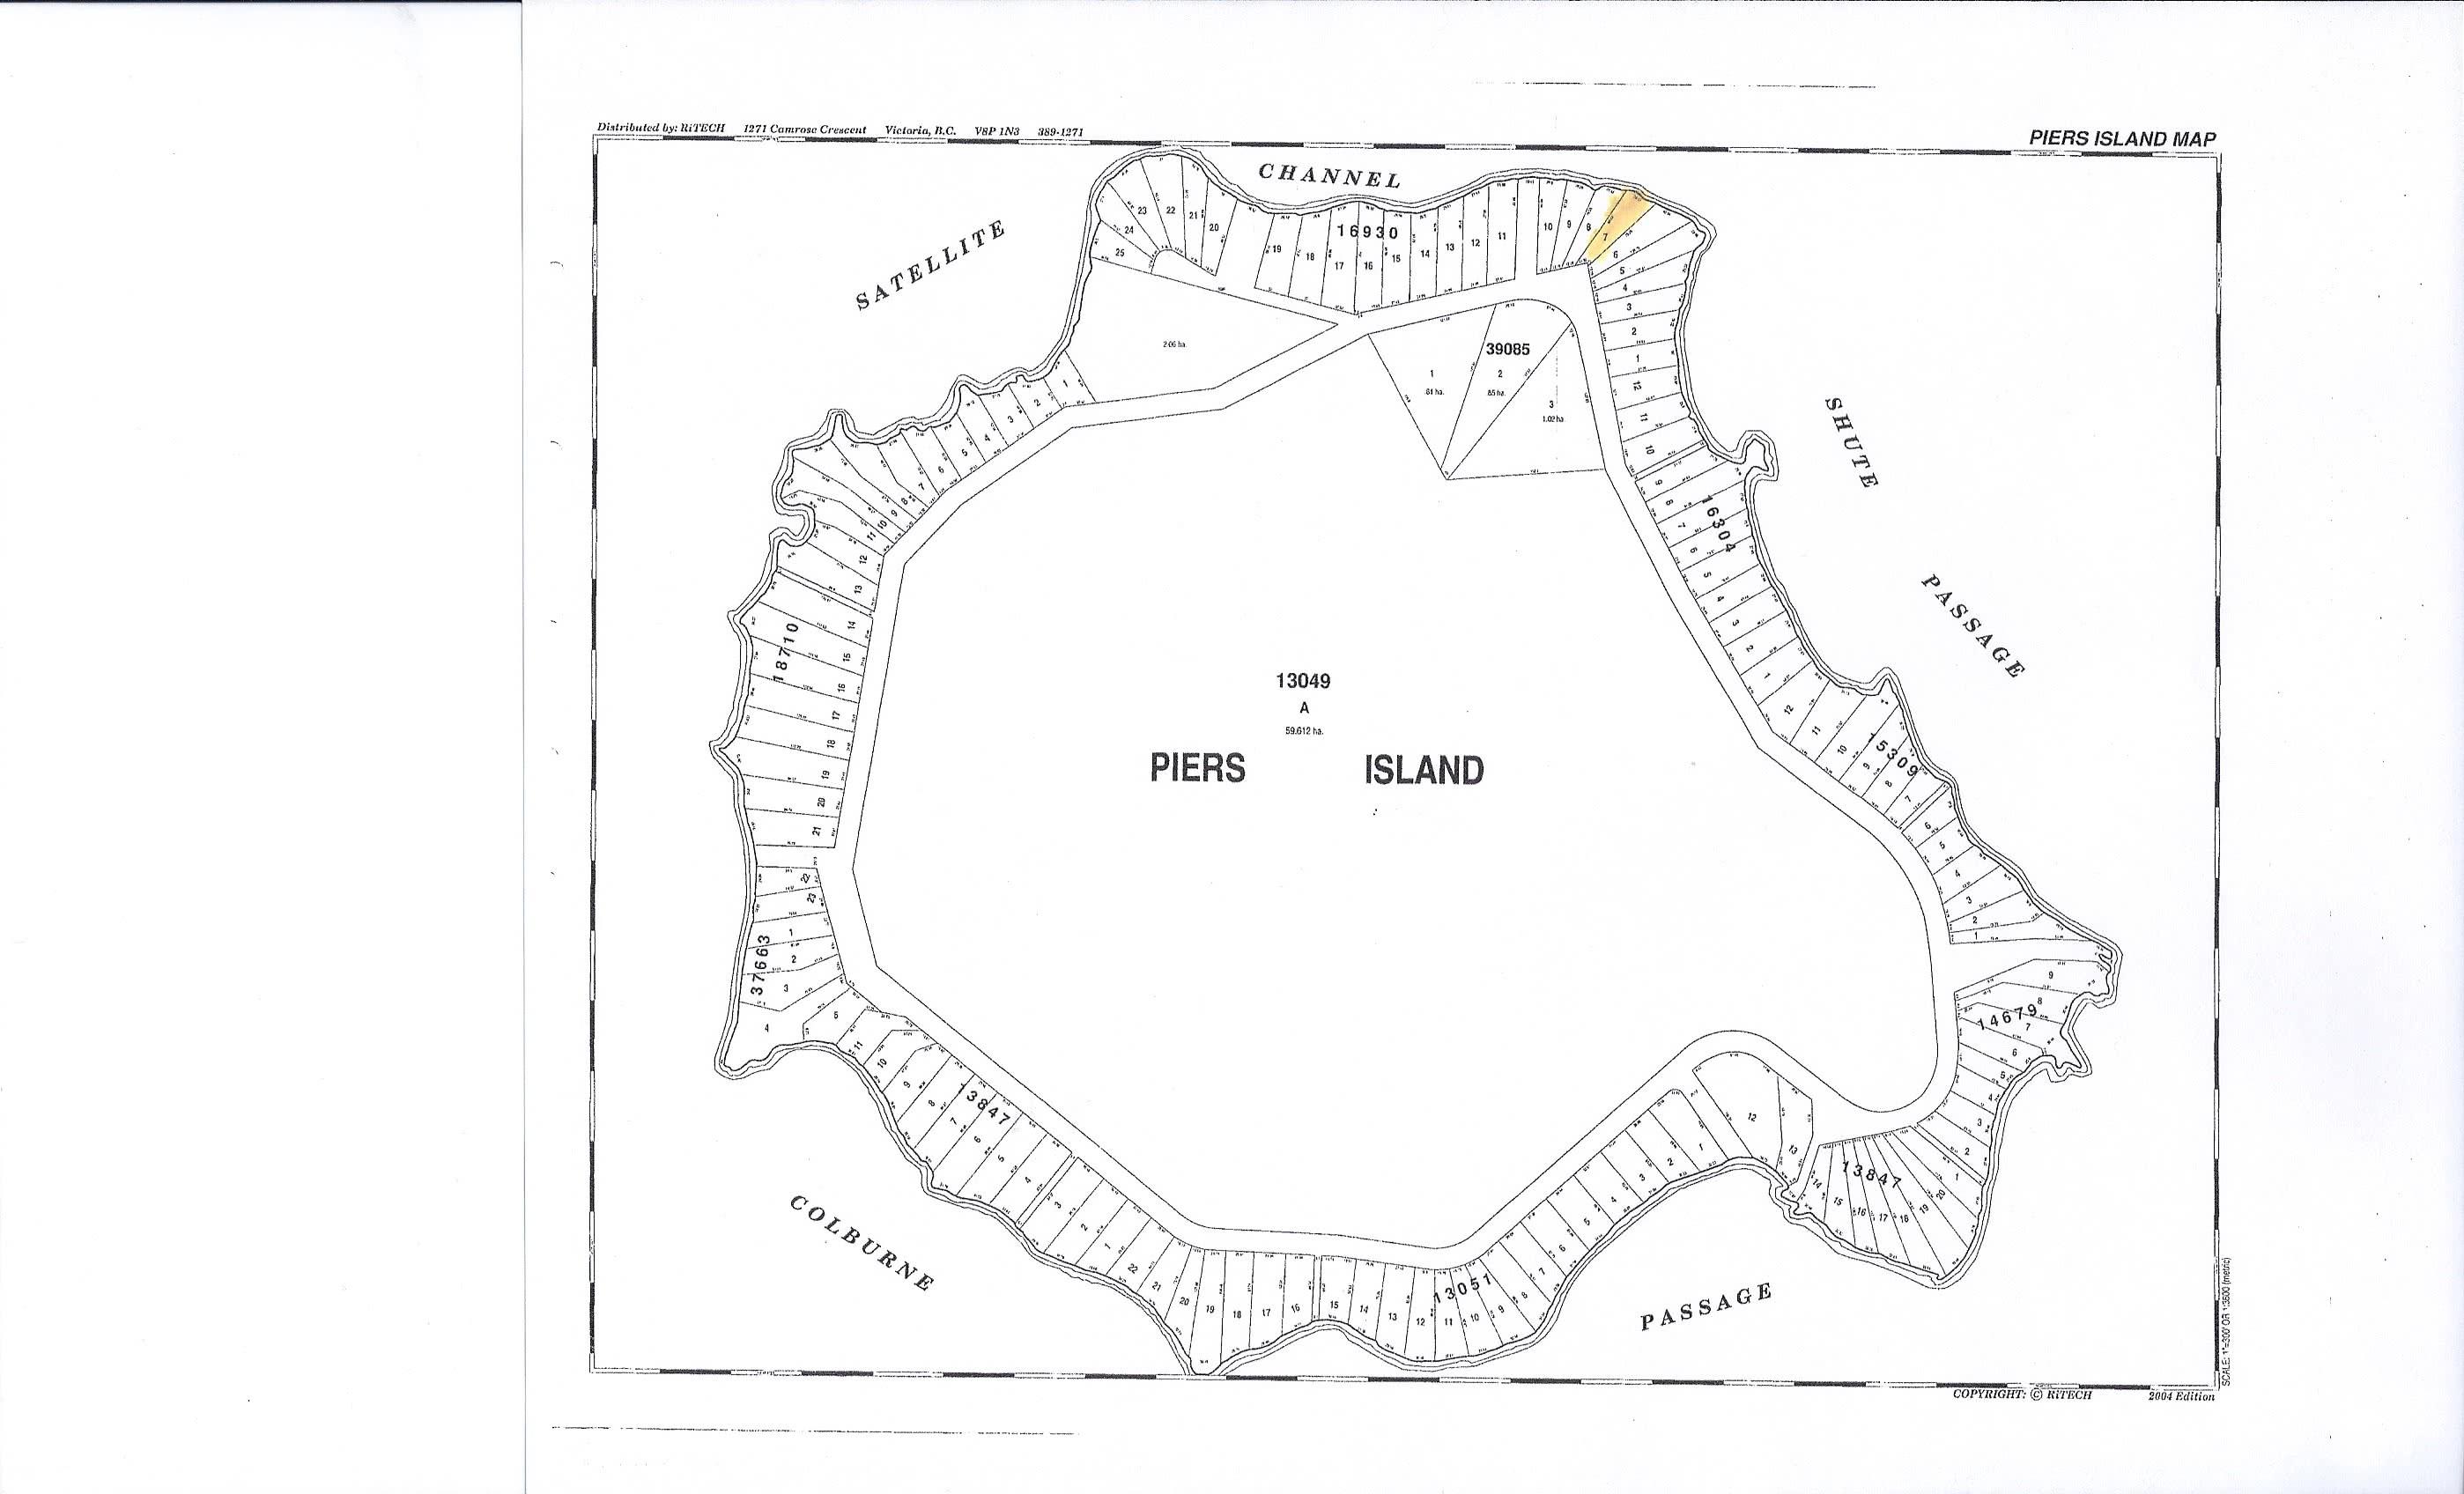 Piers Island